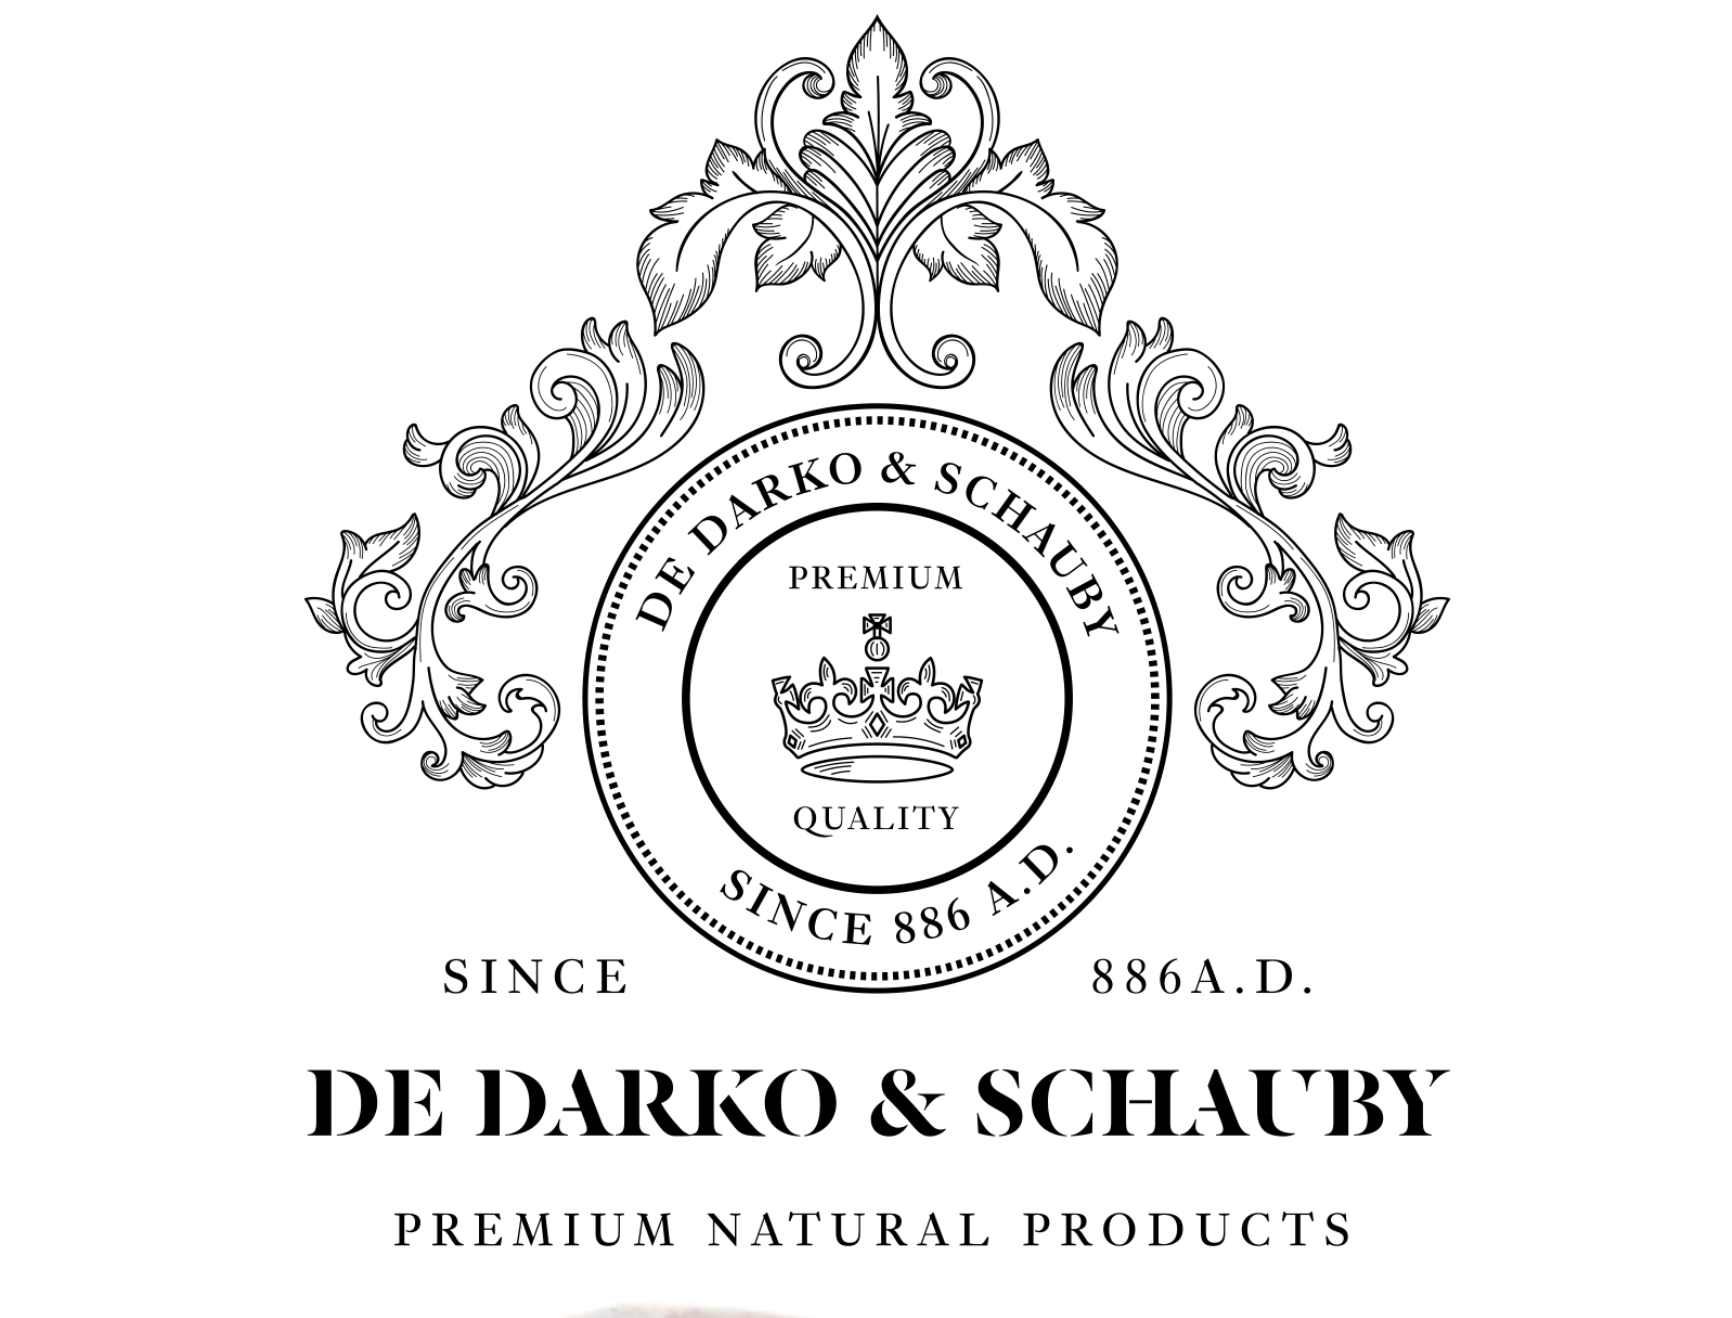 DE DARKO & SCHAUBY